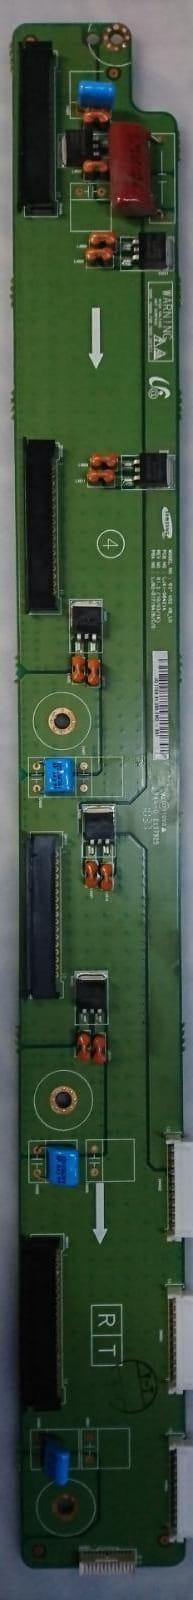 LJ41-08421A B